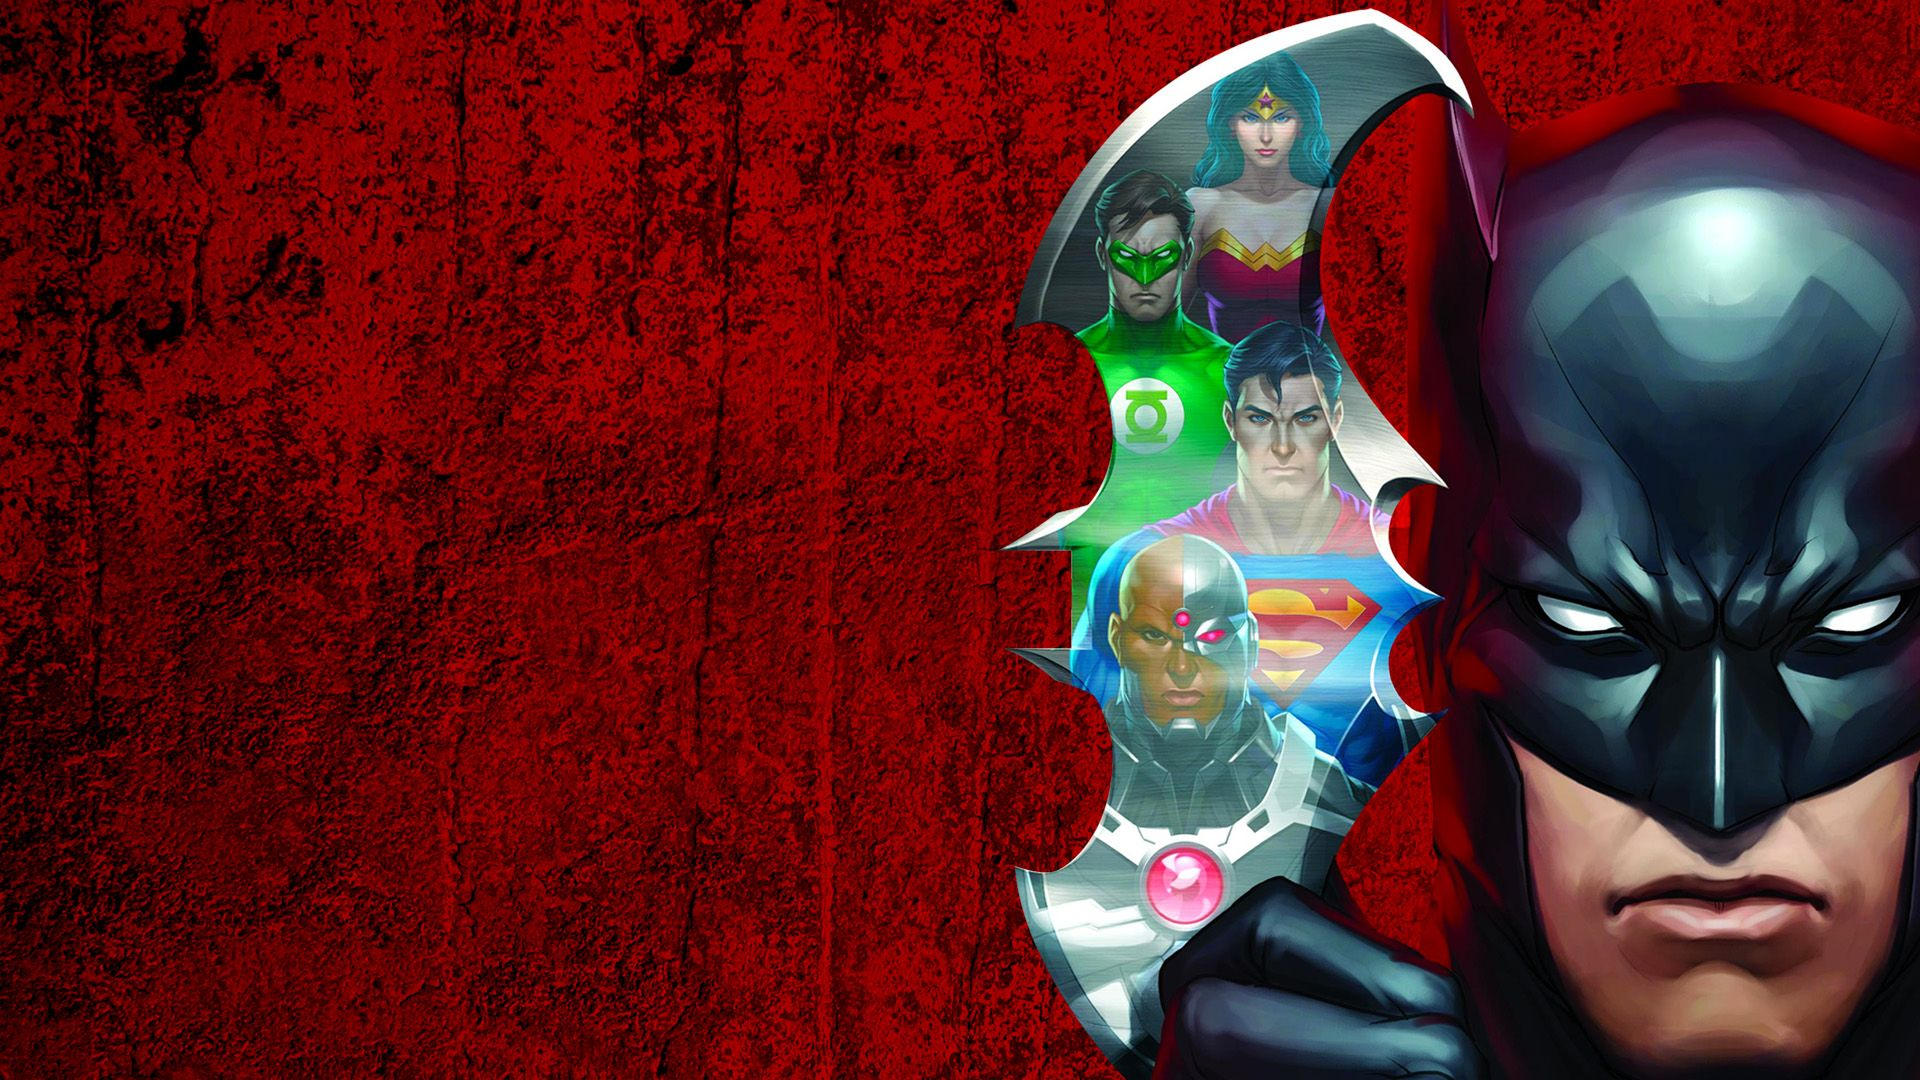 Download 1920x1080 Wallpaper Justice League Doom, 2012